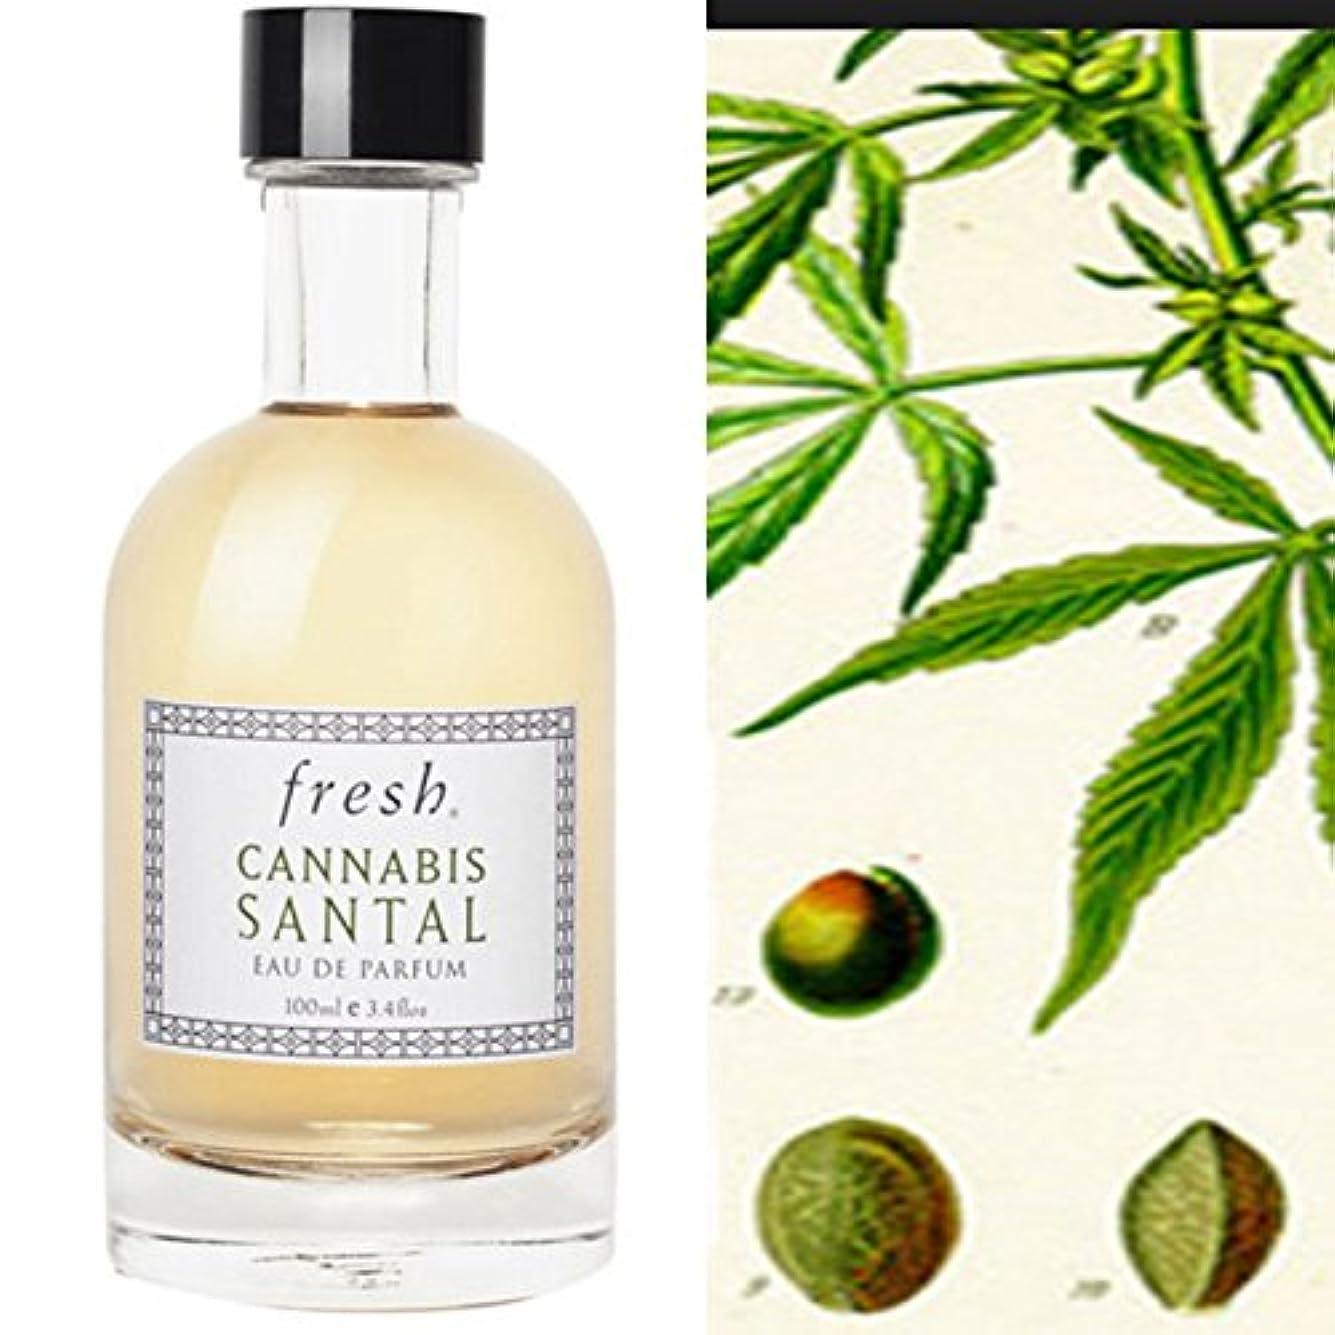 Fresh (フレッシュ) 大麻サンタルオードパルファム,100ml(3.4oz)- Cannabis Santal 。 [並行輸入品] [海外直送品]